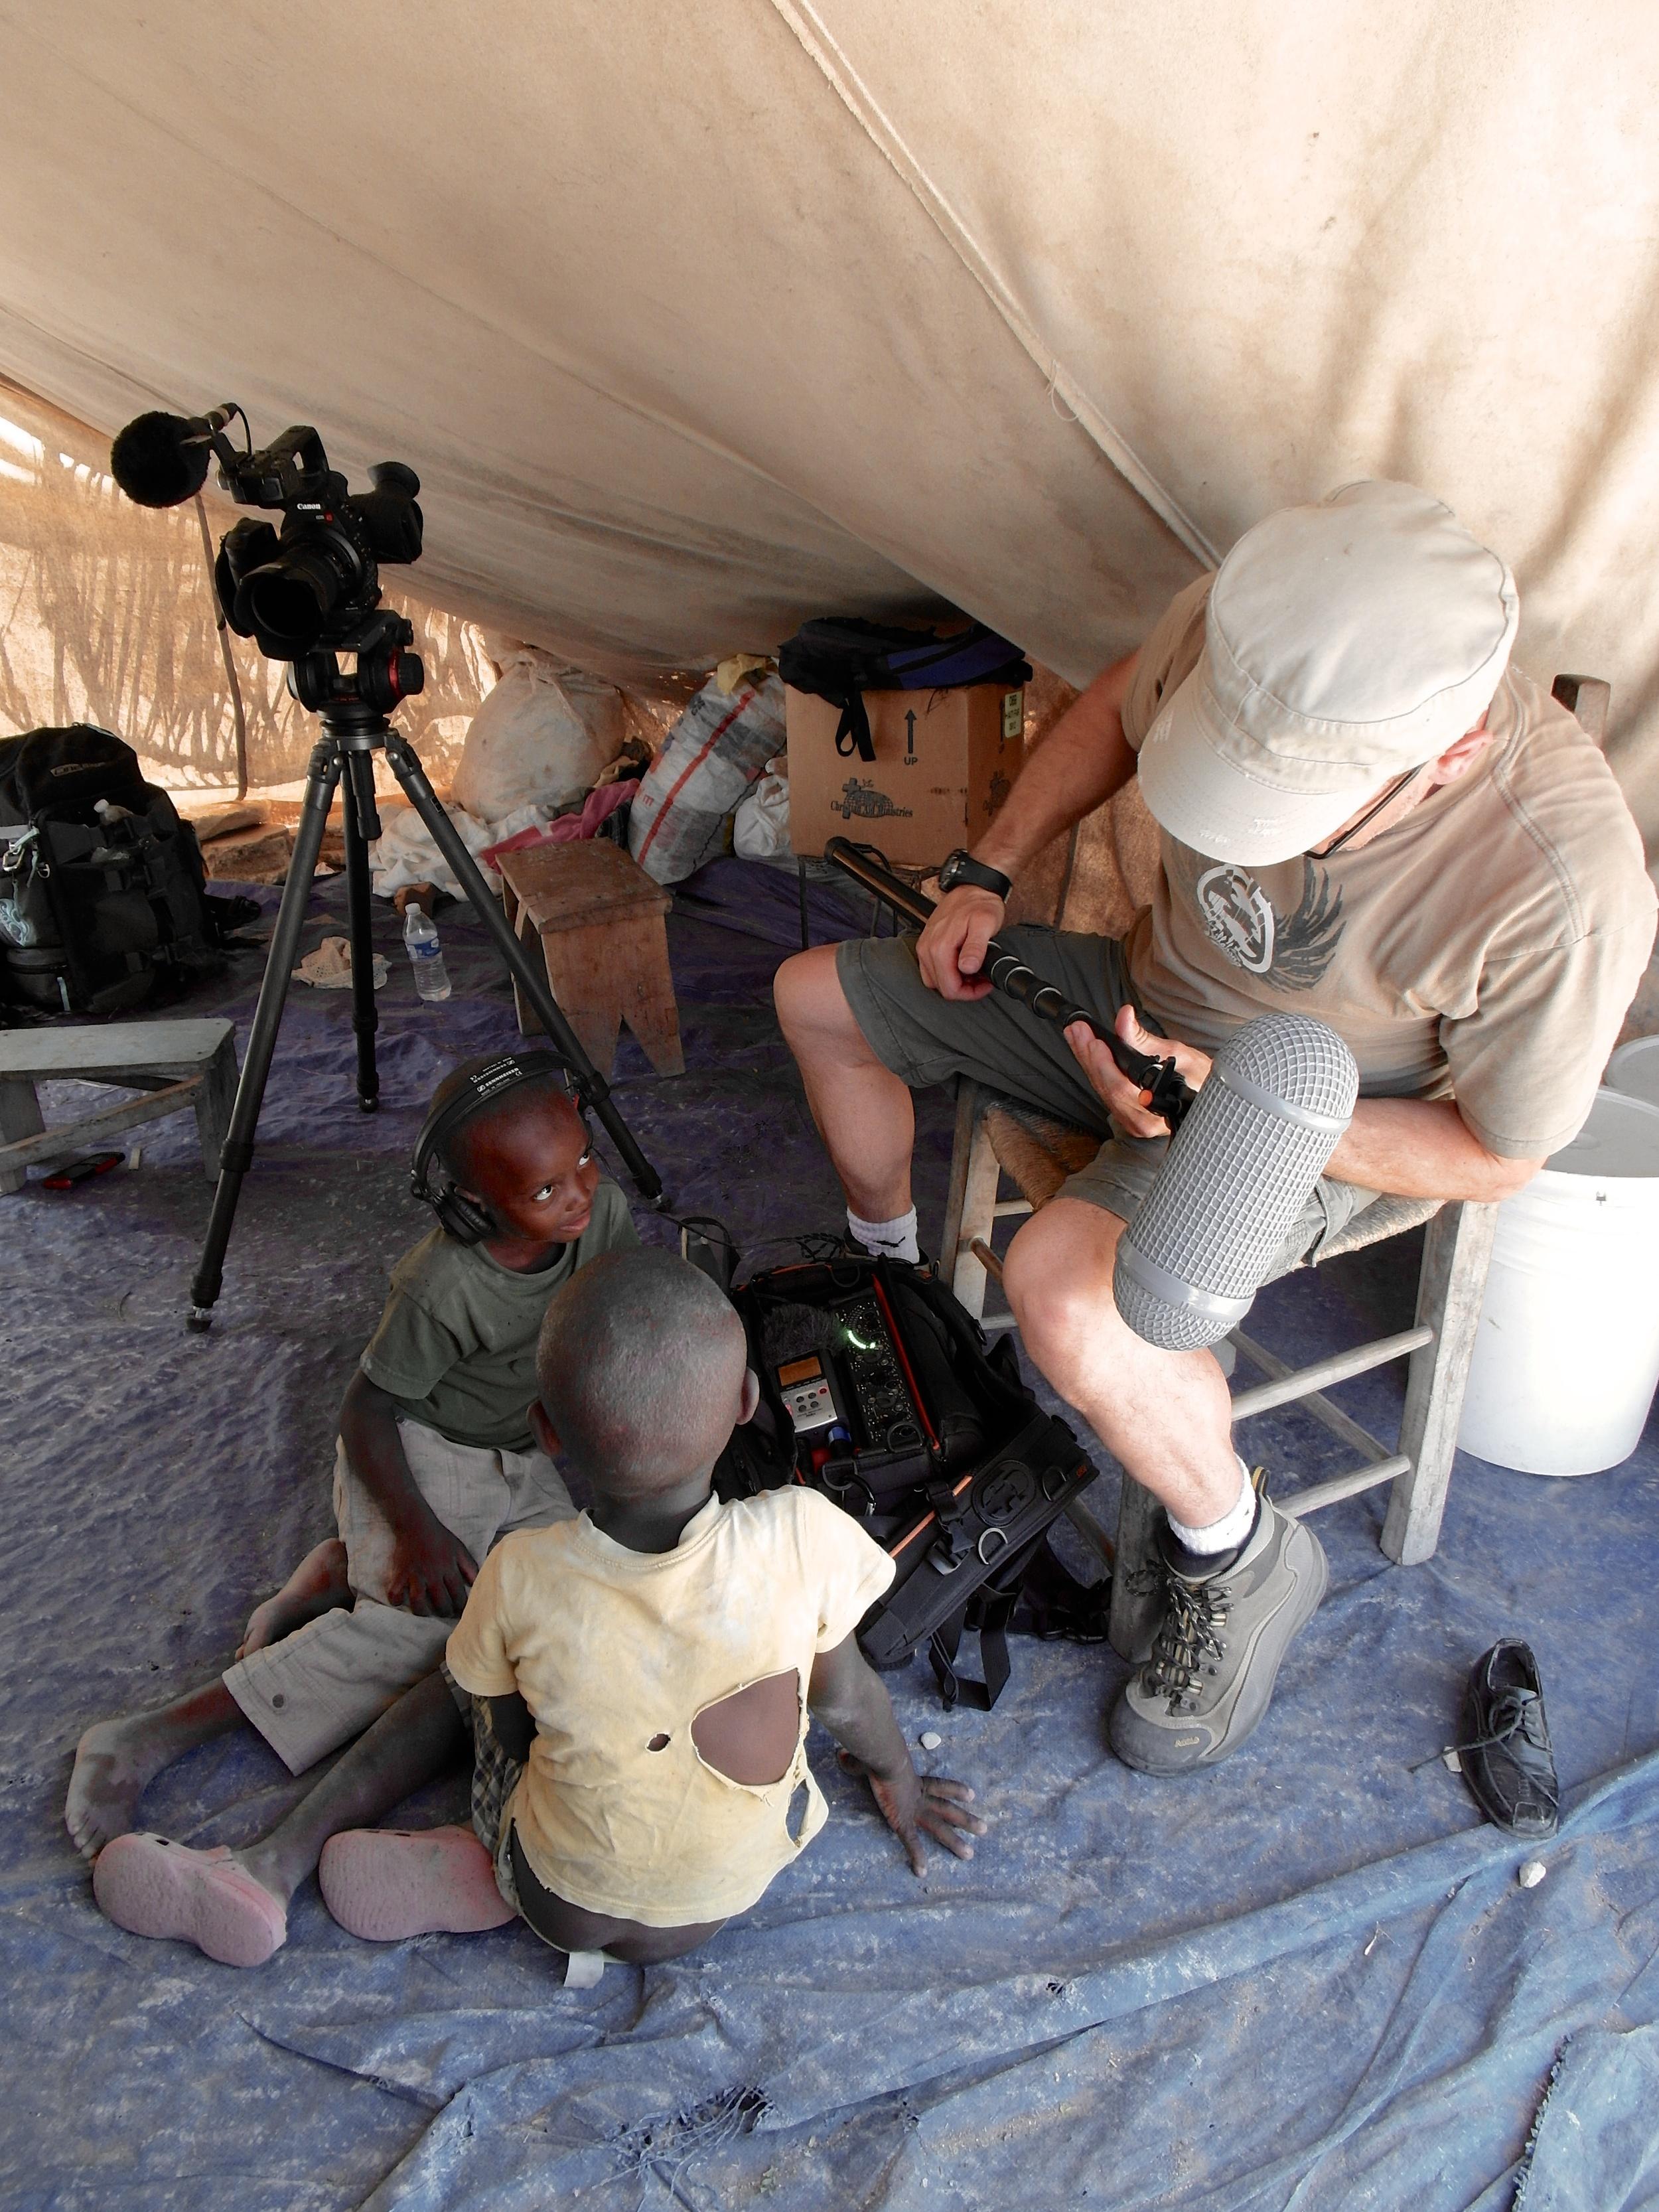 Haiti - Boys in Tent.jpg